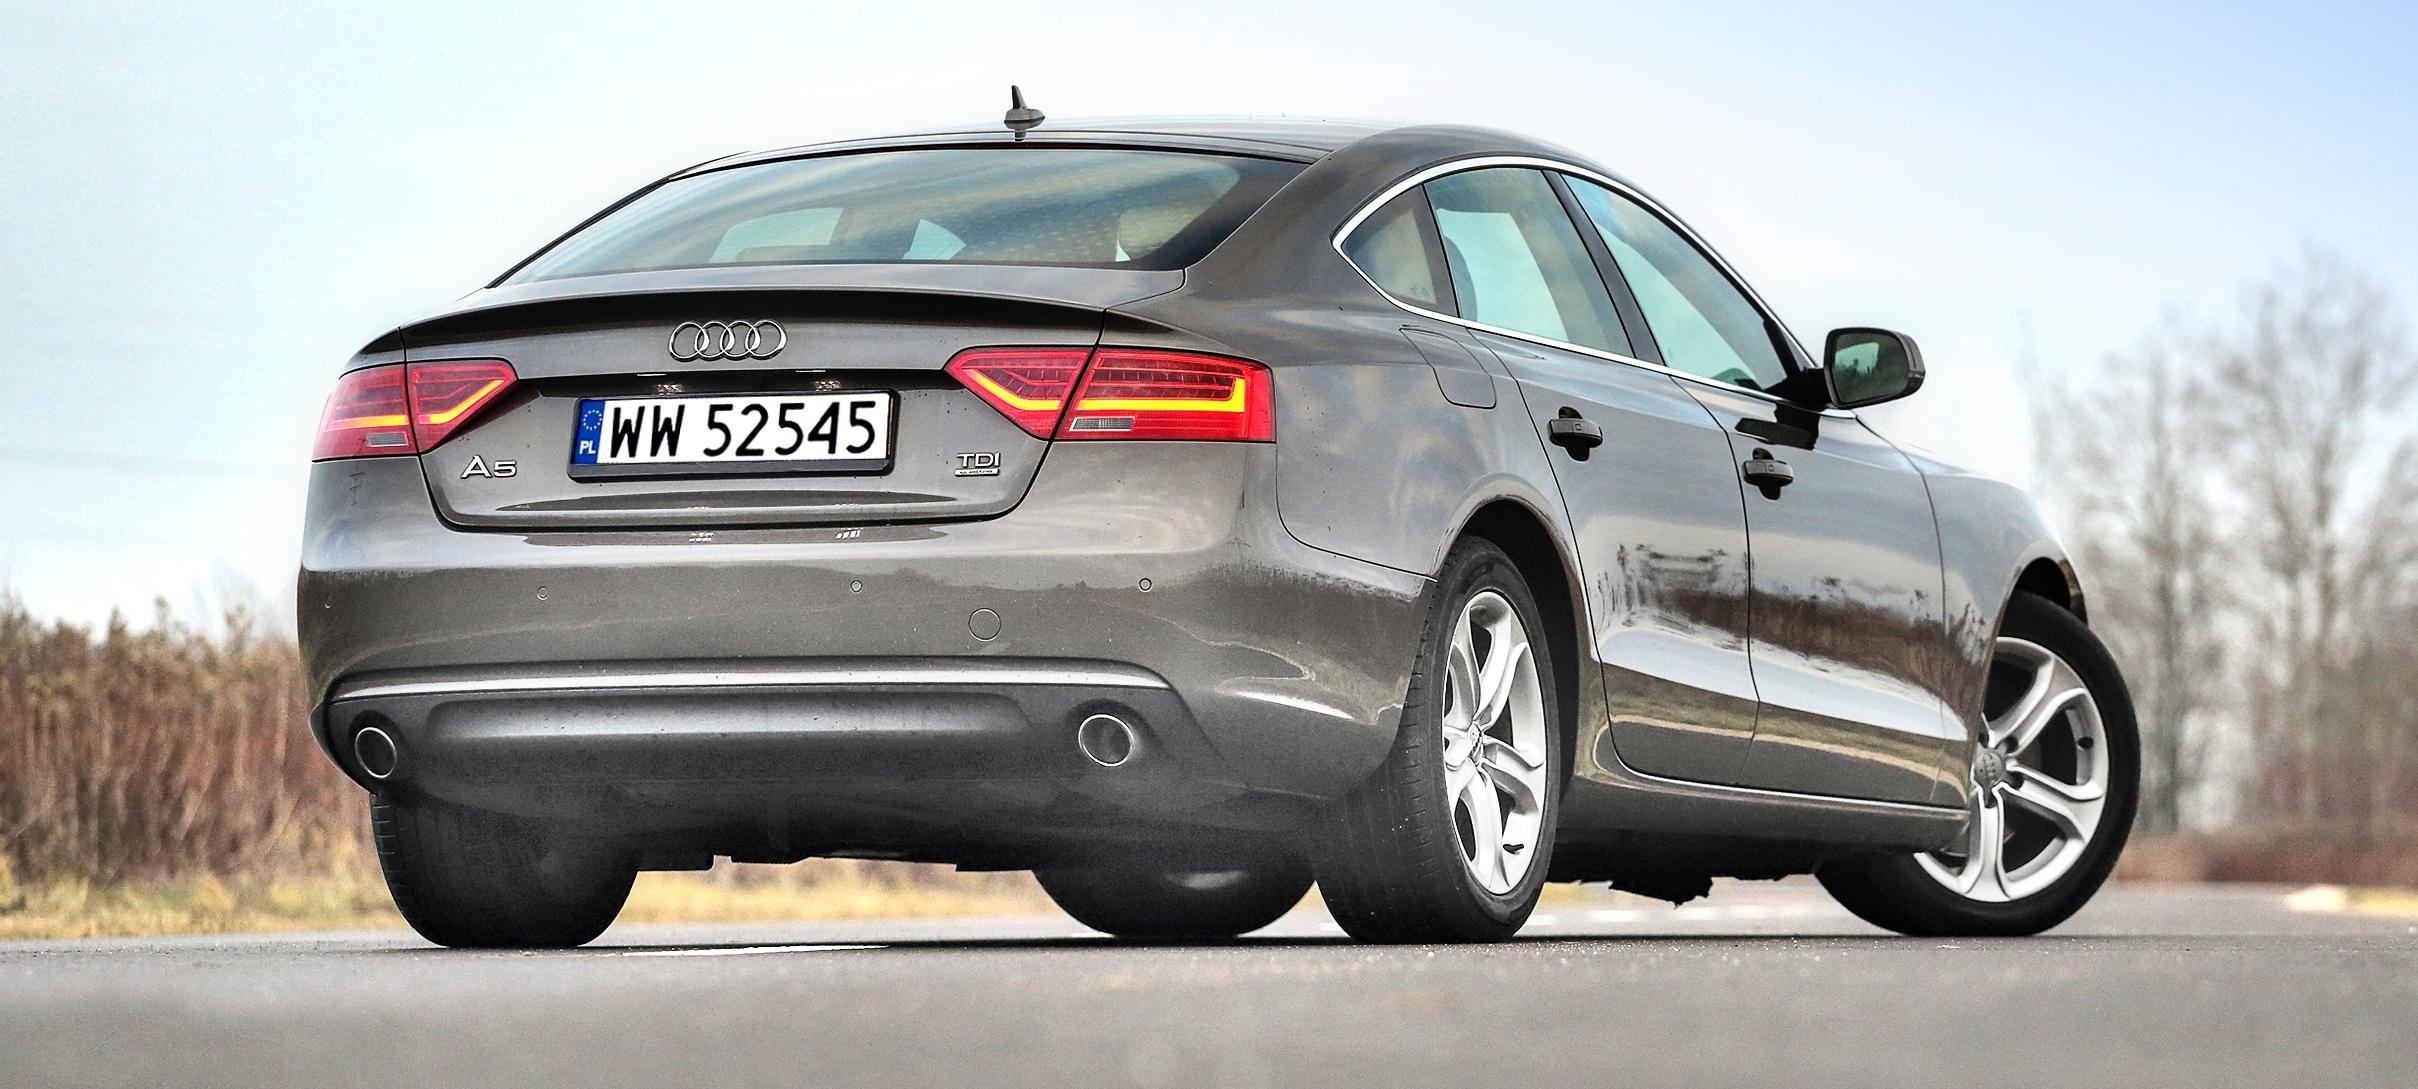 Audi_A5_Sportback_9